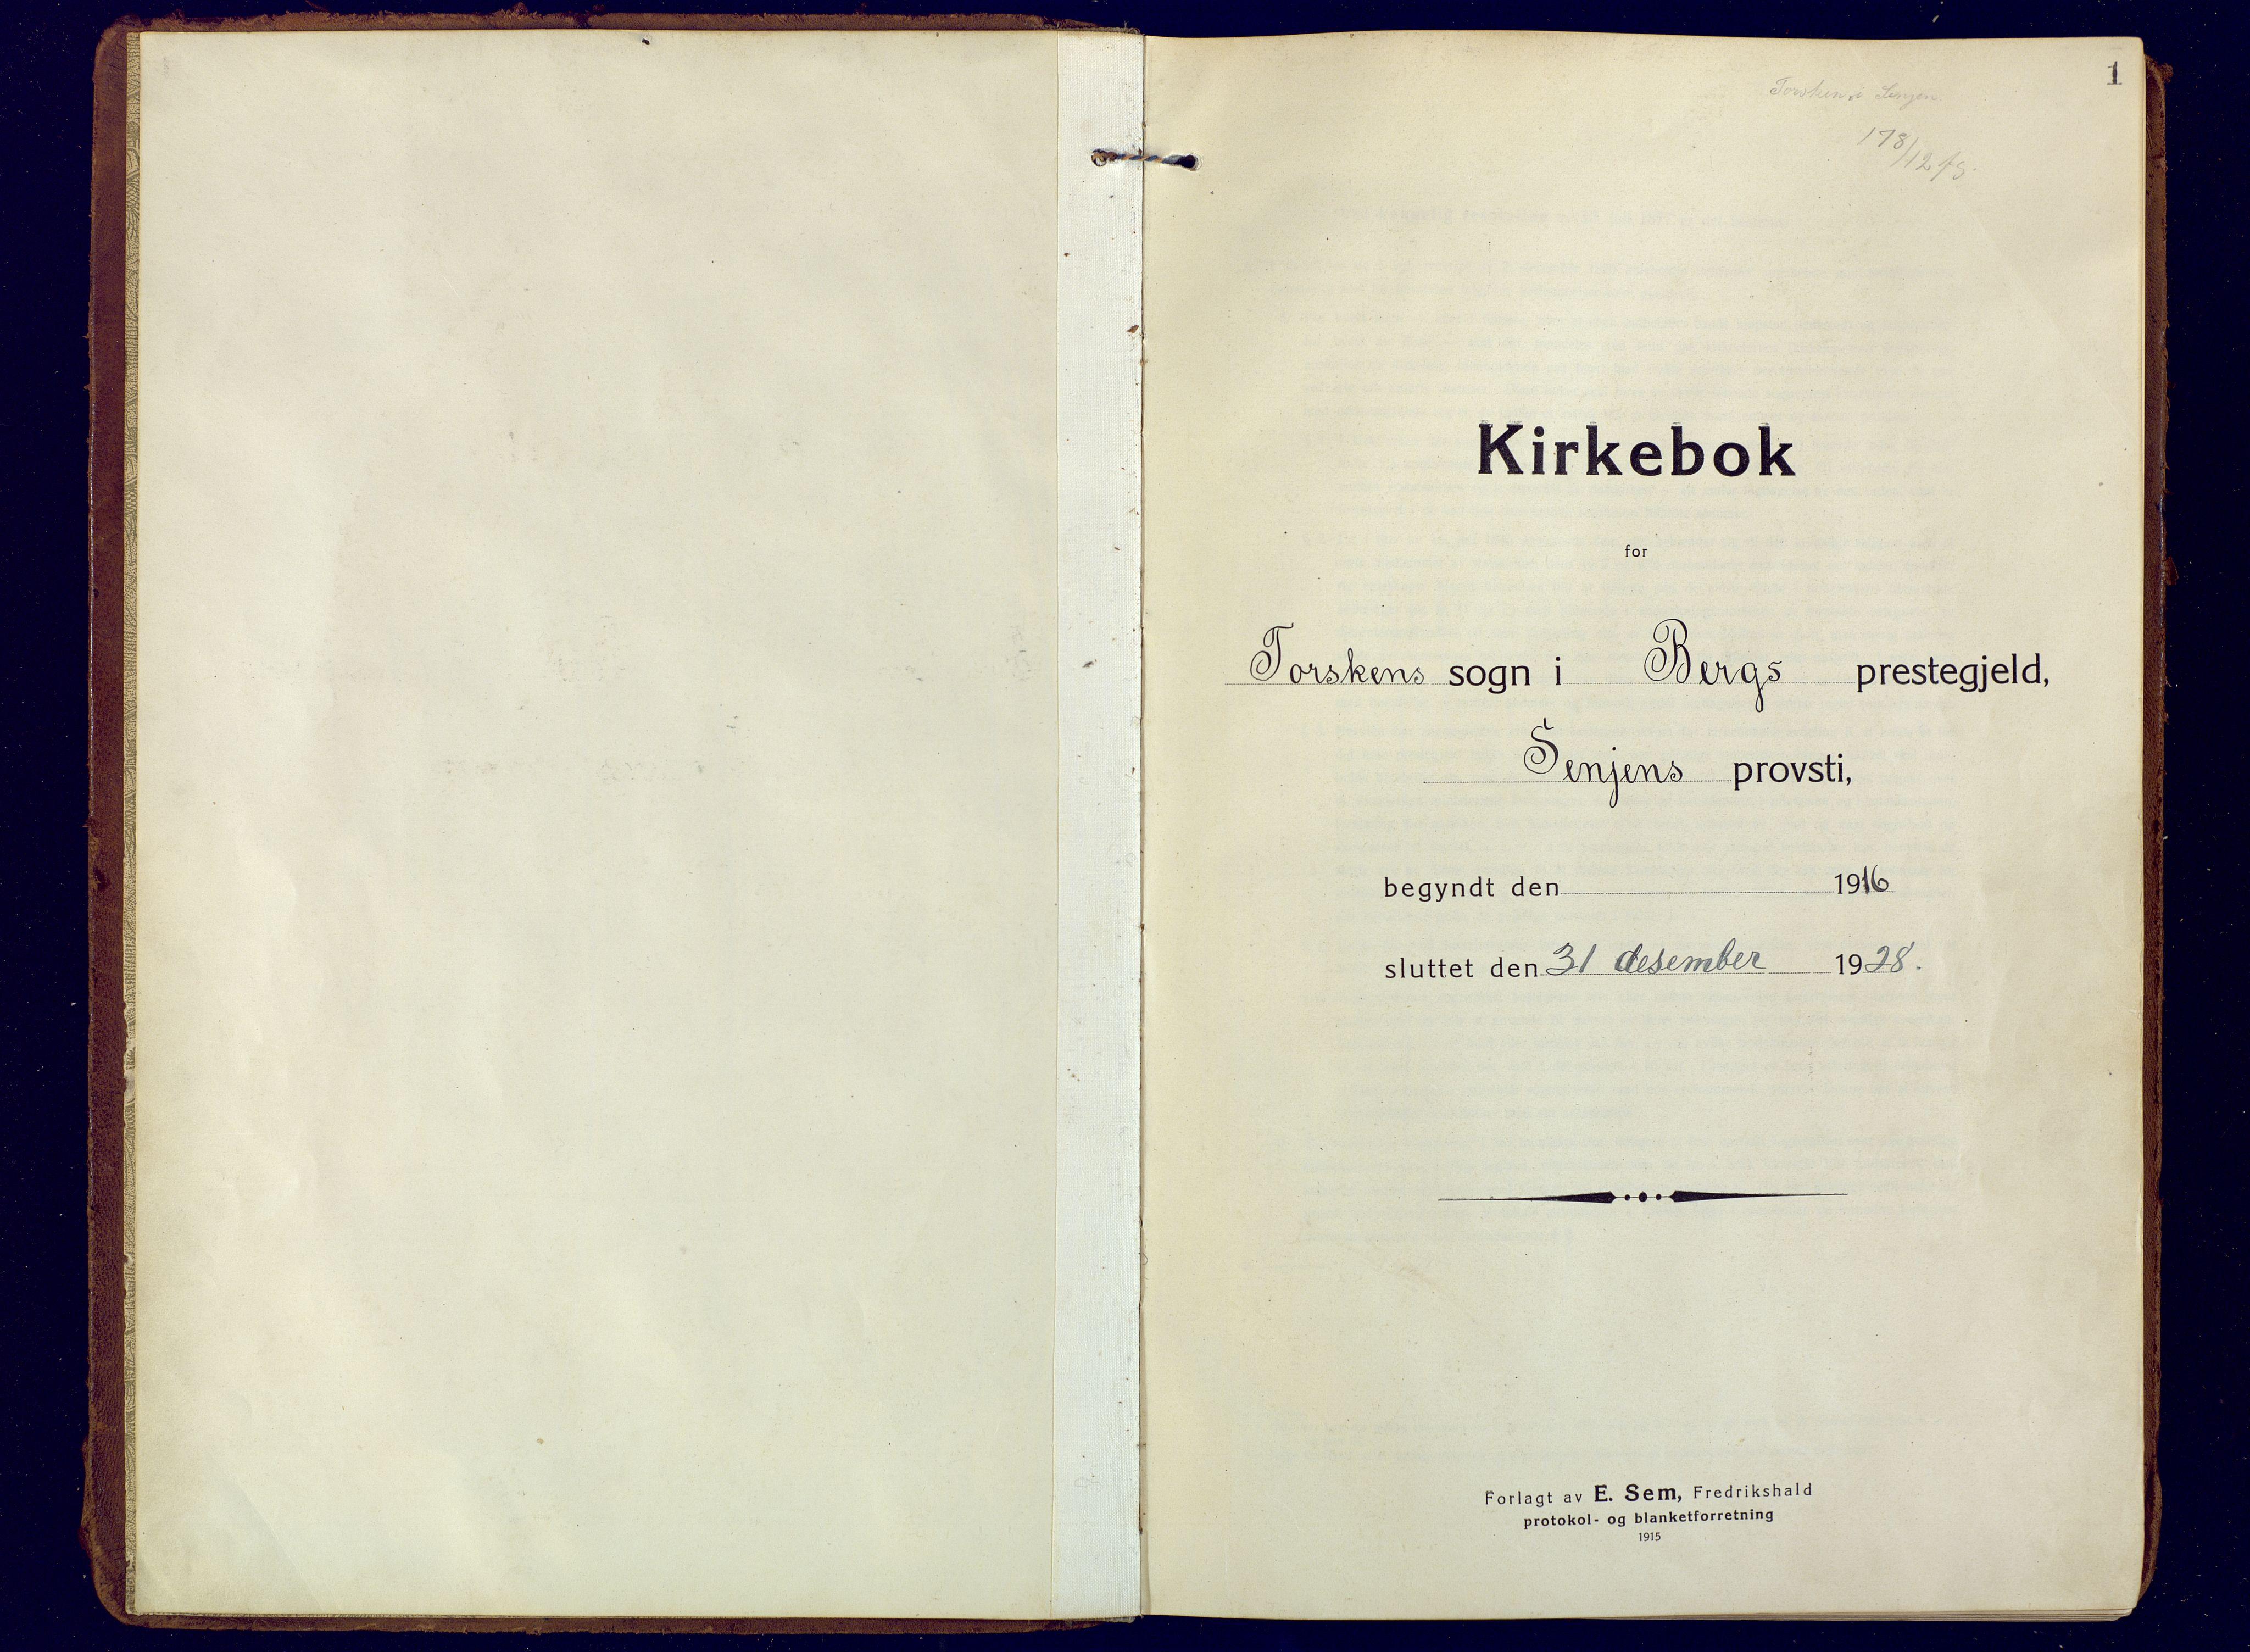 SATØ, Mefjord/Berg sokneprestkontor, G/Ga/Gaa: Ministerialbok nr. 10, 1916-1928, s. 1